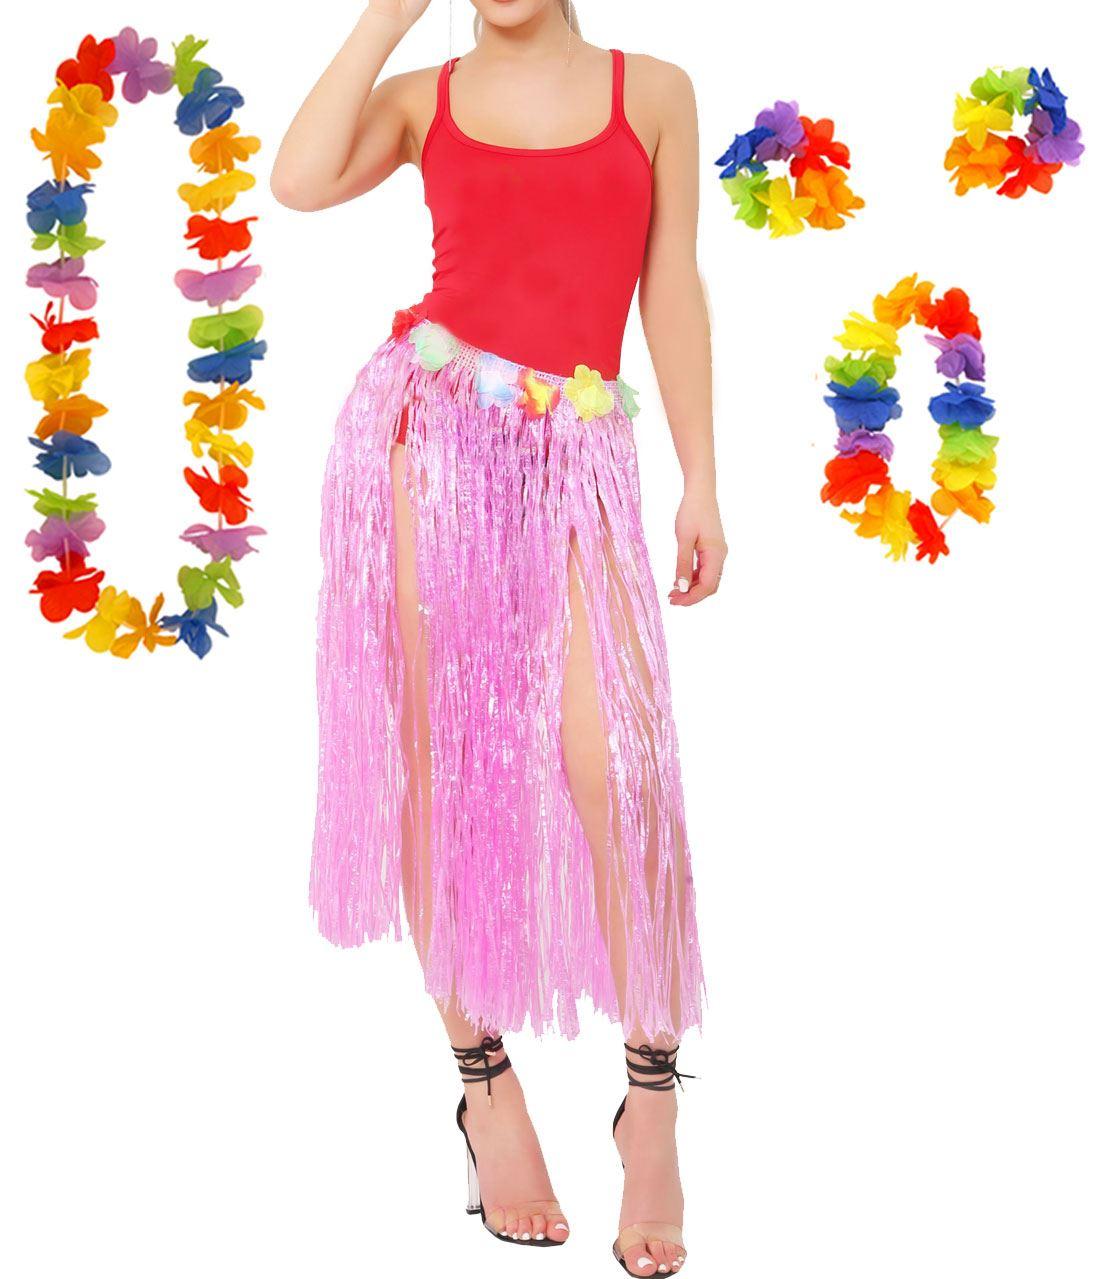 4 PIECE LEI SET HAWAIIAN LUAU PINK LONG HULA SKIRT 80CM WITH FLOWER WAISTBAND